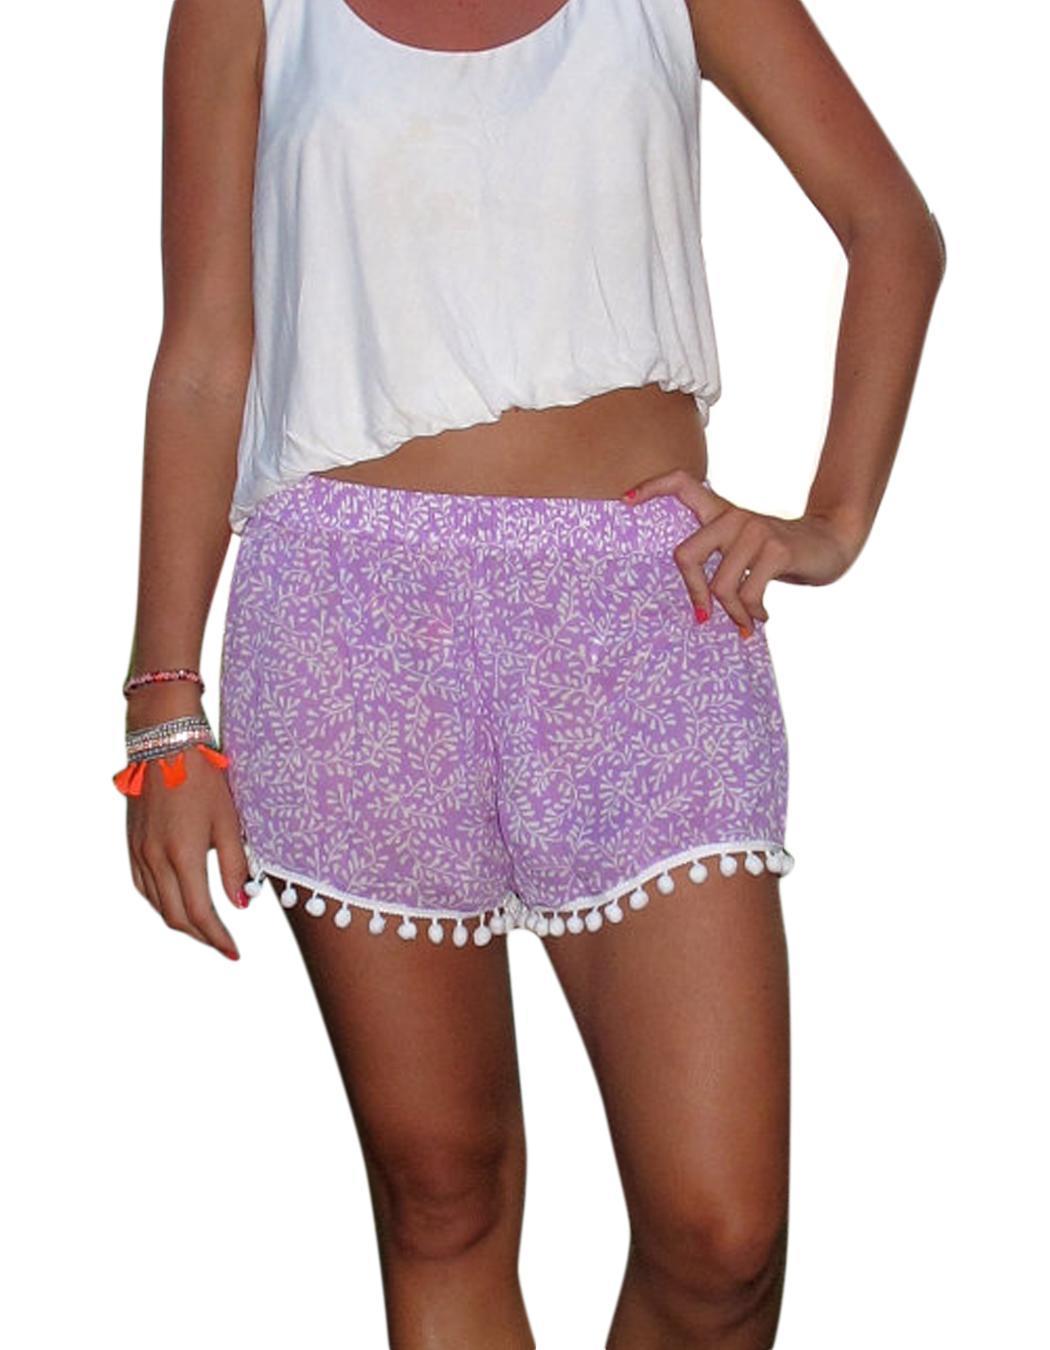 Boho hippy donna pantaloncini hot estate pantaloncini casual costume da bagno ebay - Costume da bagno inglese ...